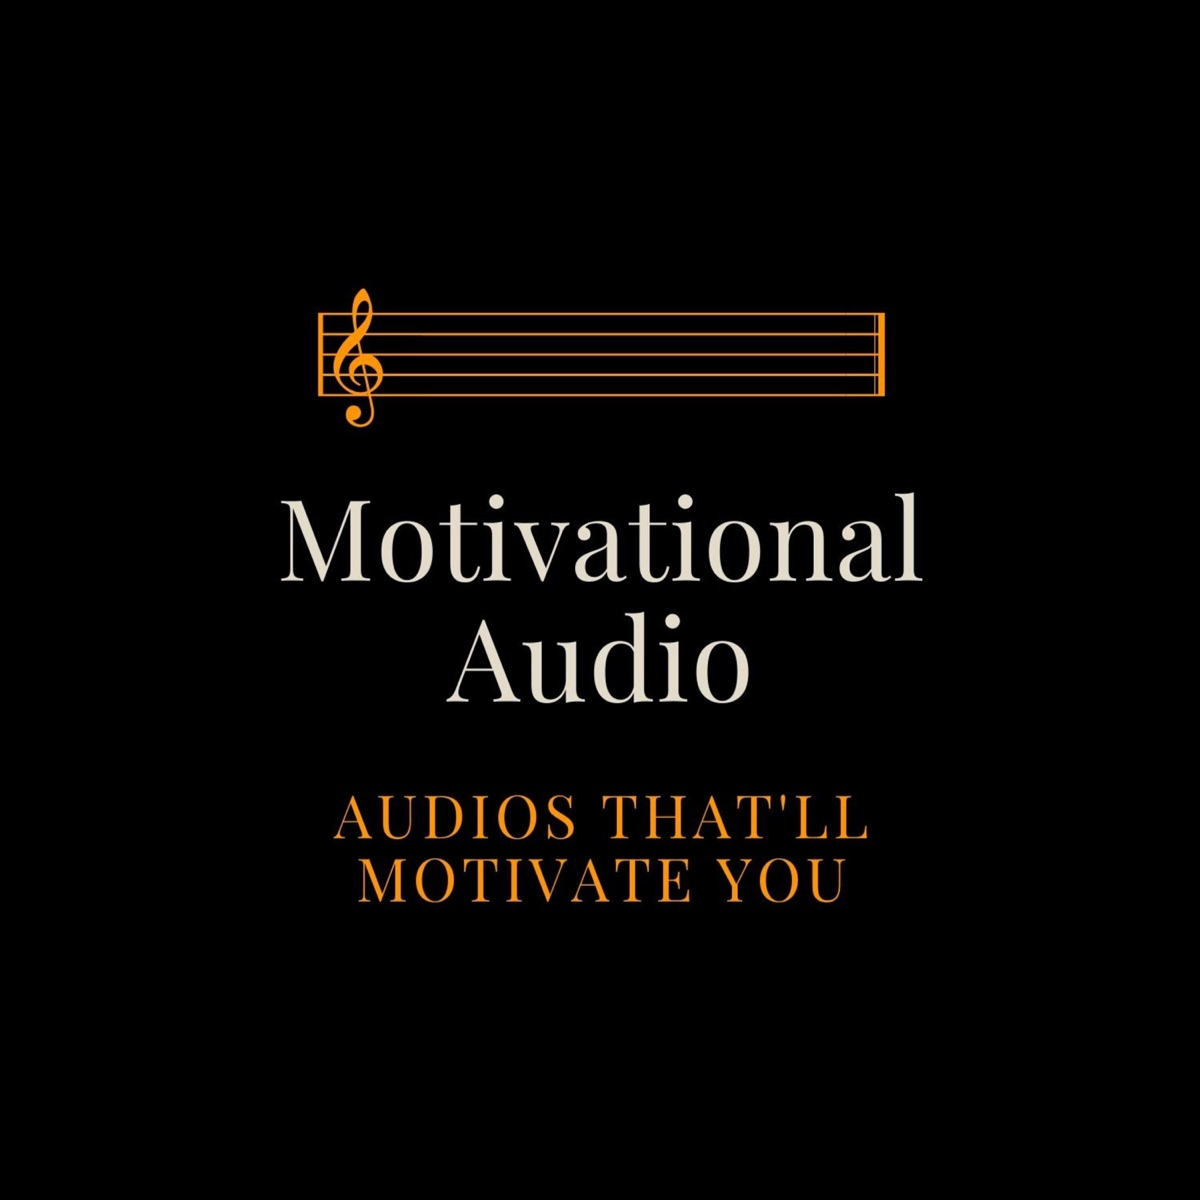 Motivational Audio